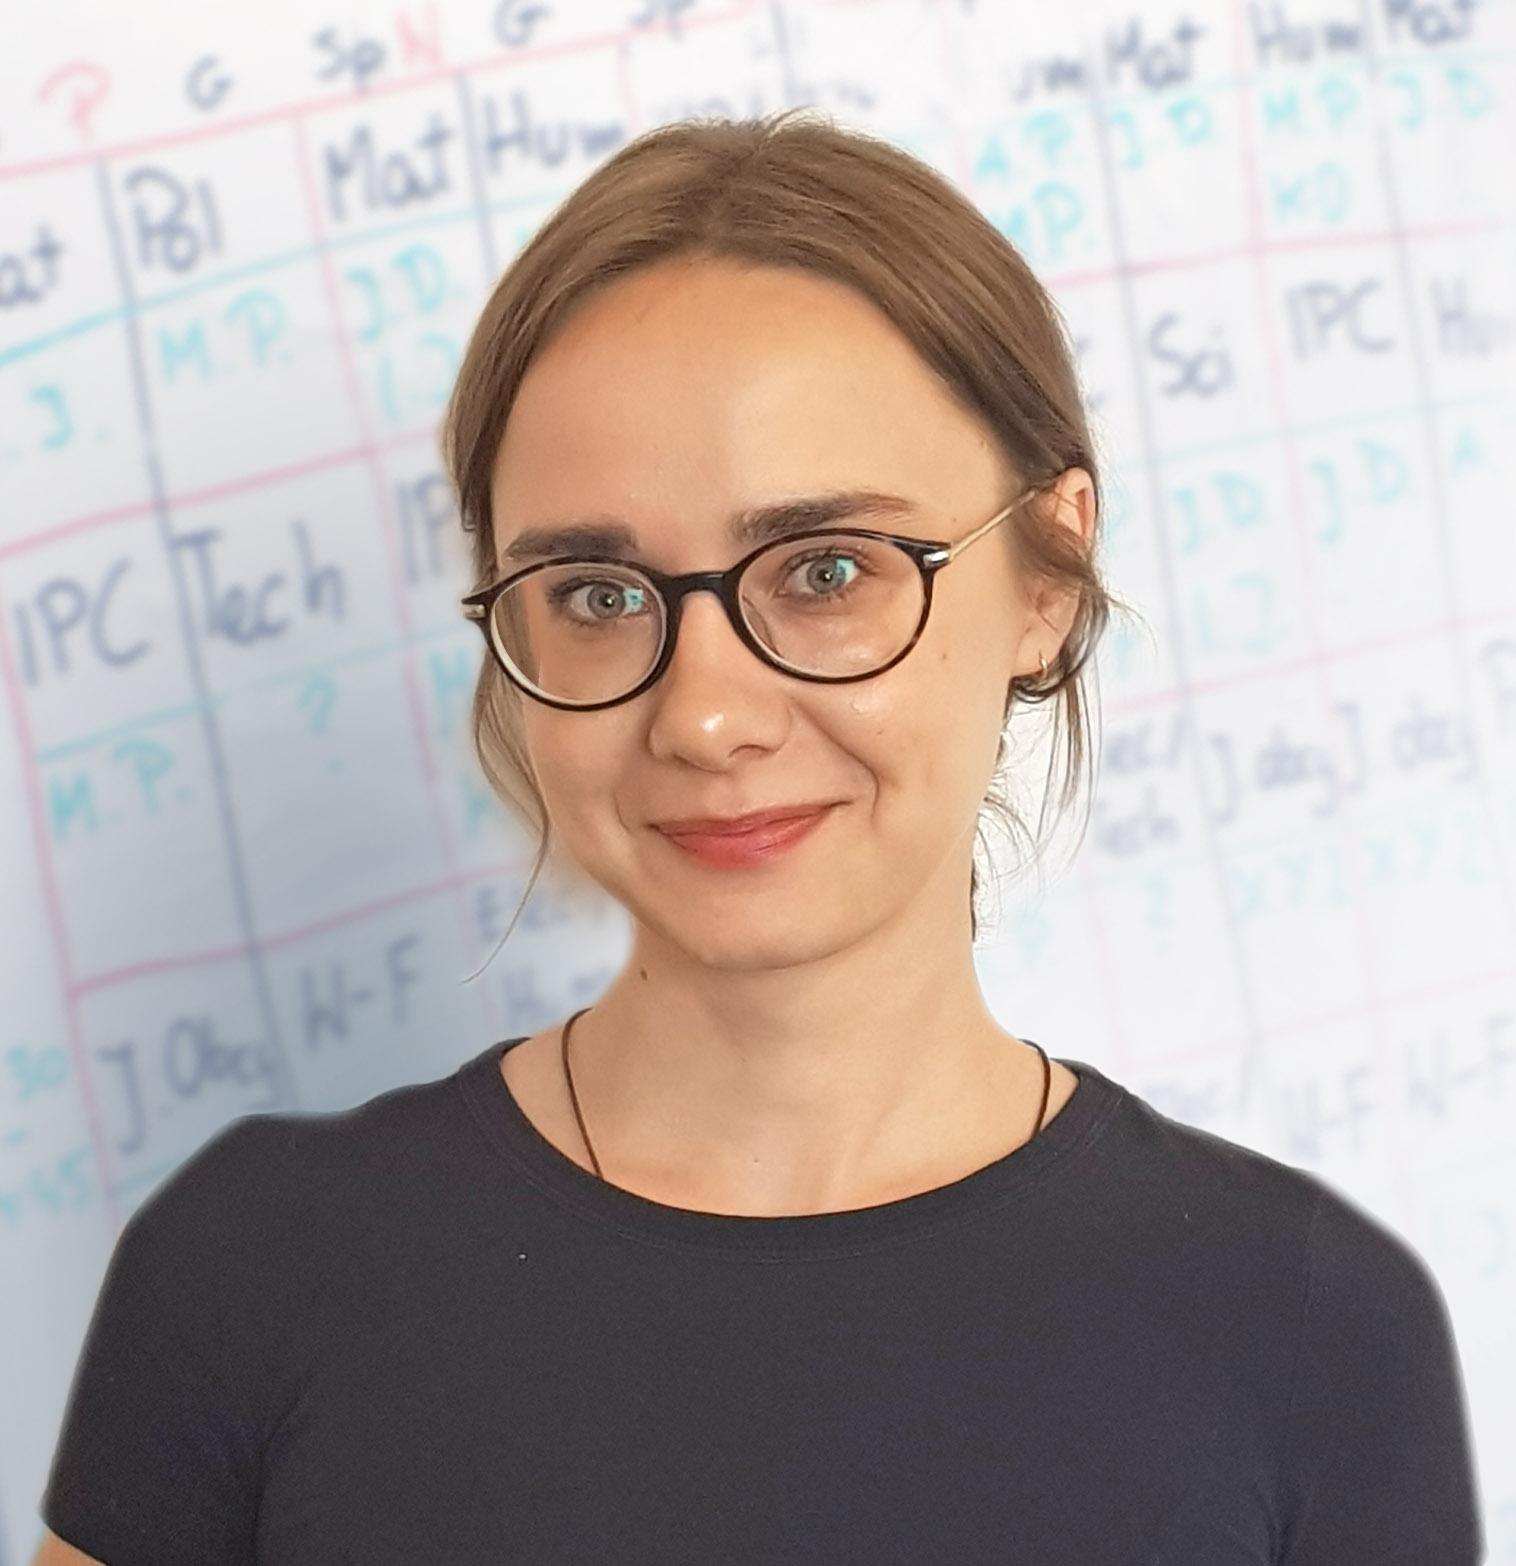 Marta Pawelec